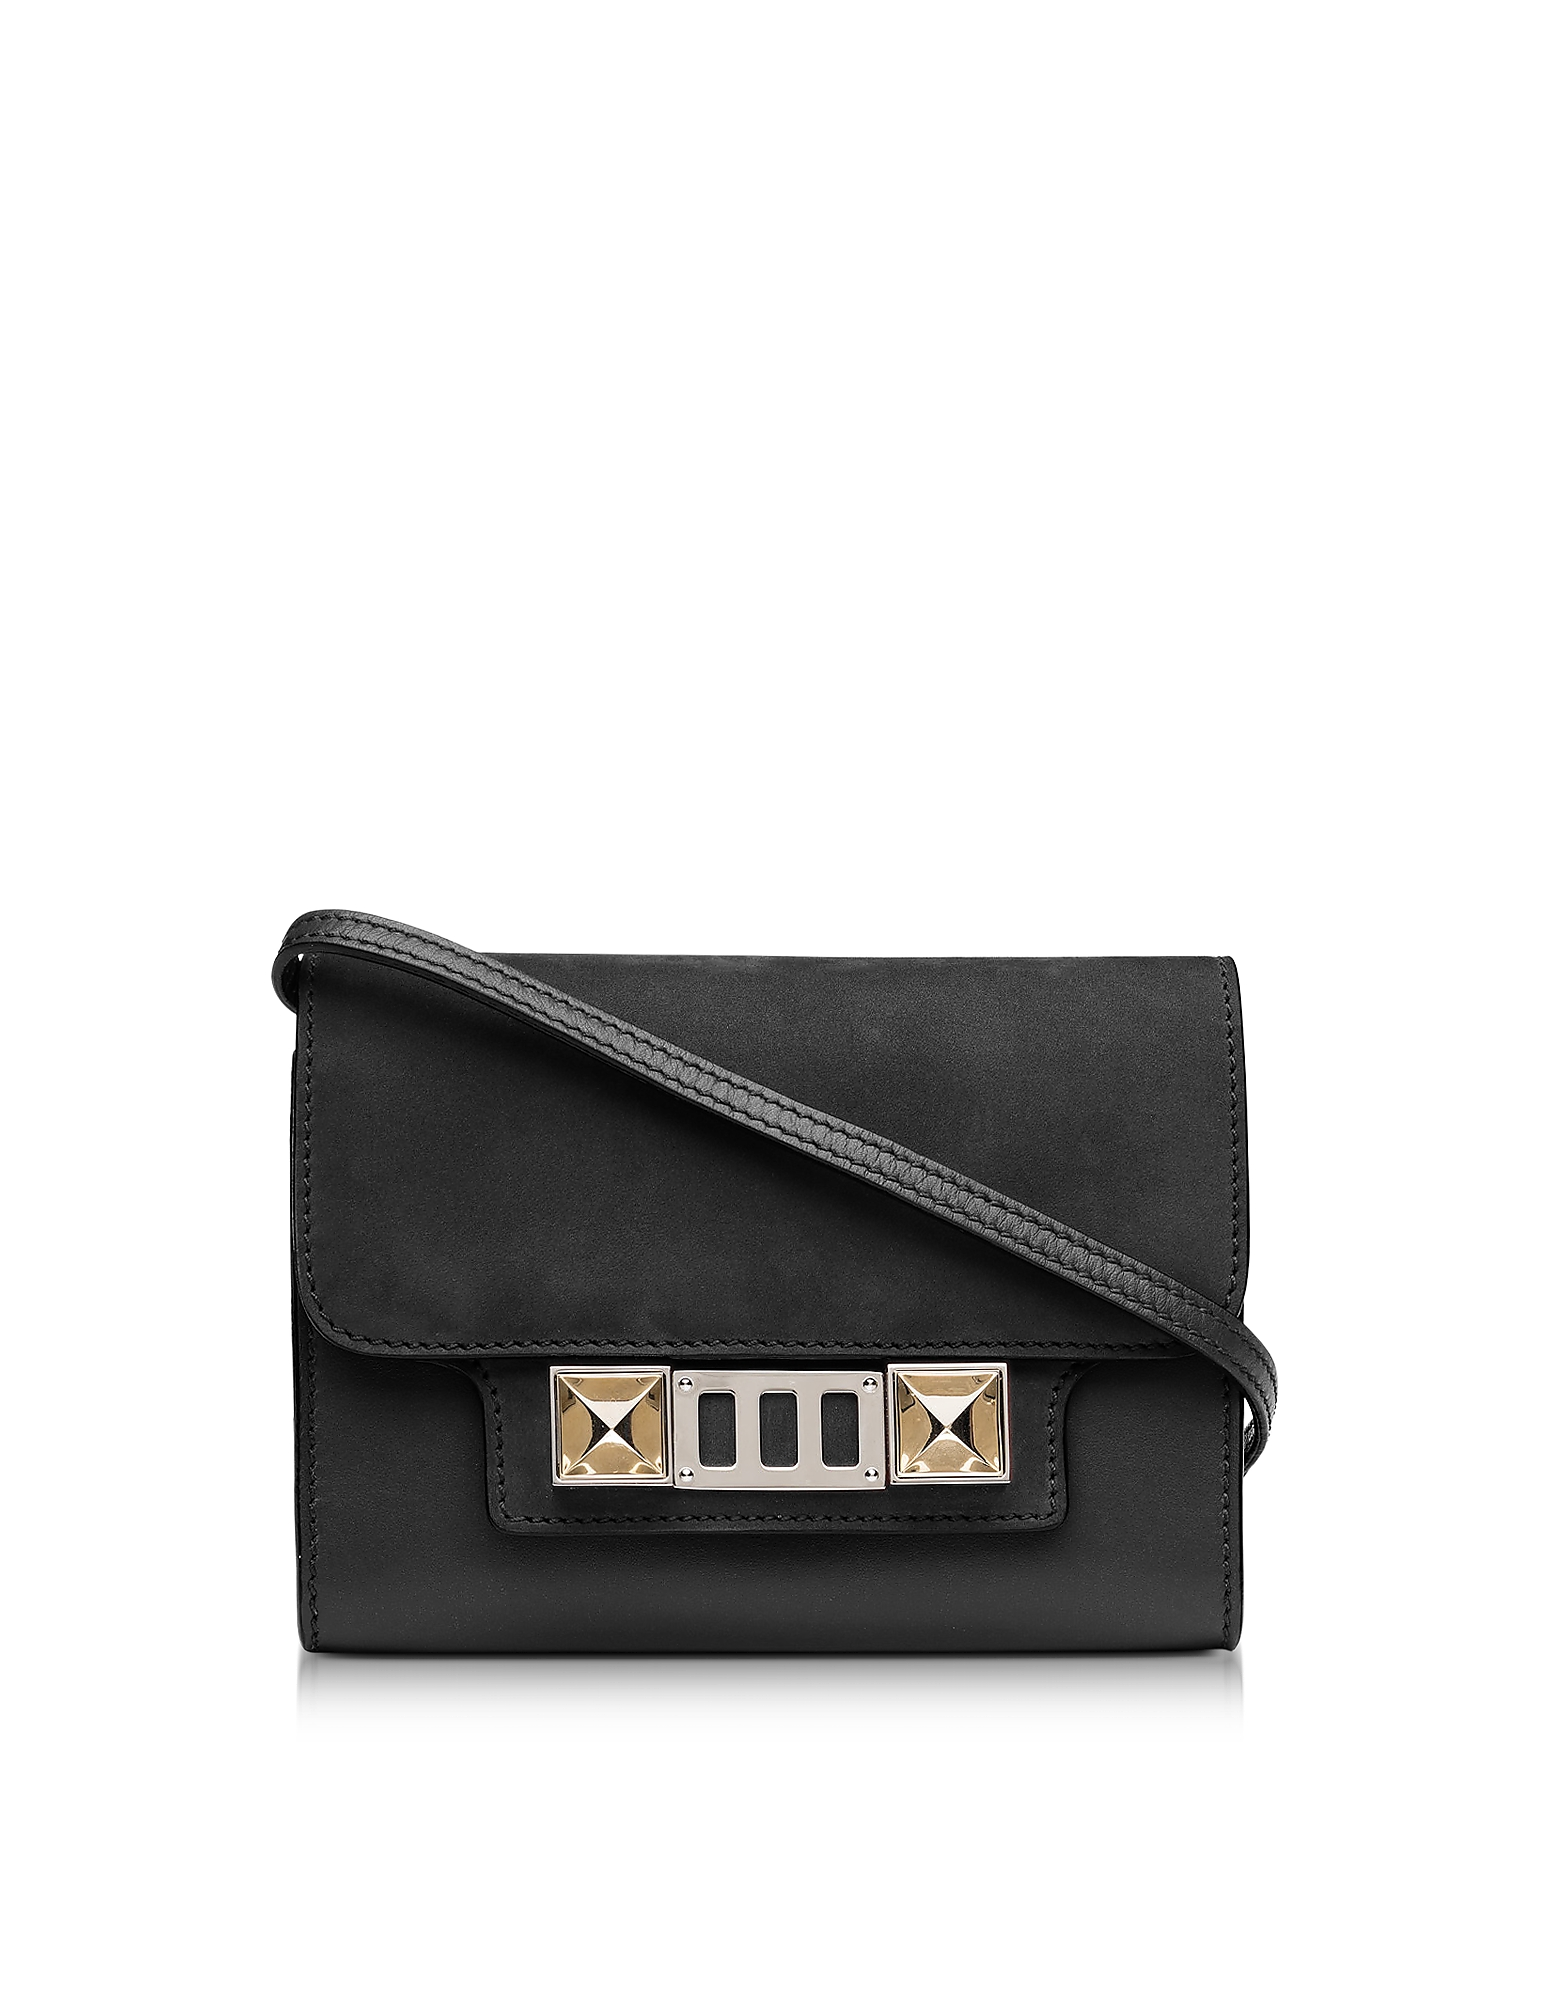 PS11 Black Leather and Nubuck Wallet w/Shoulder Strap